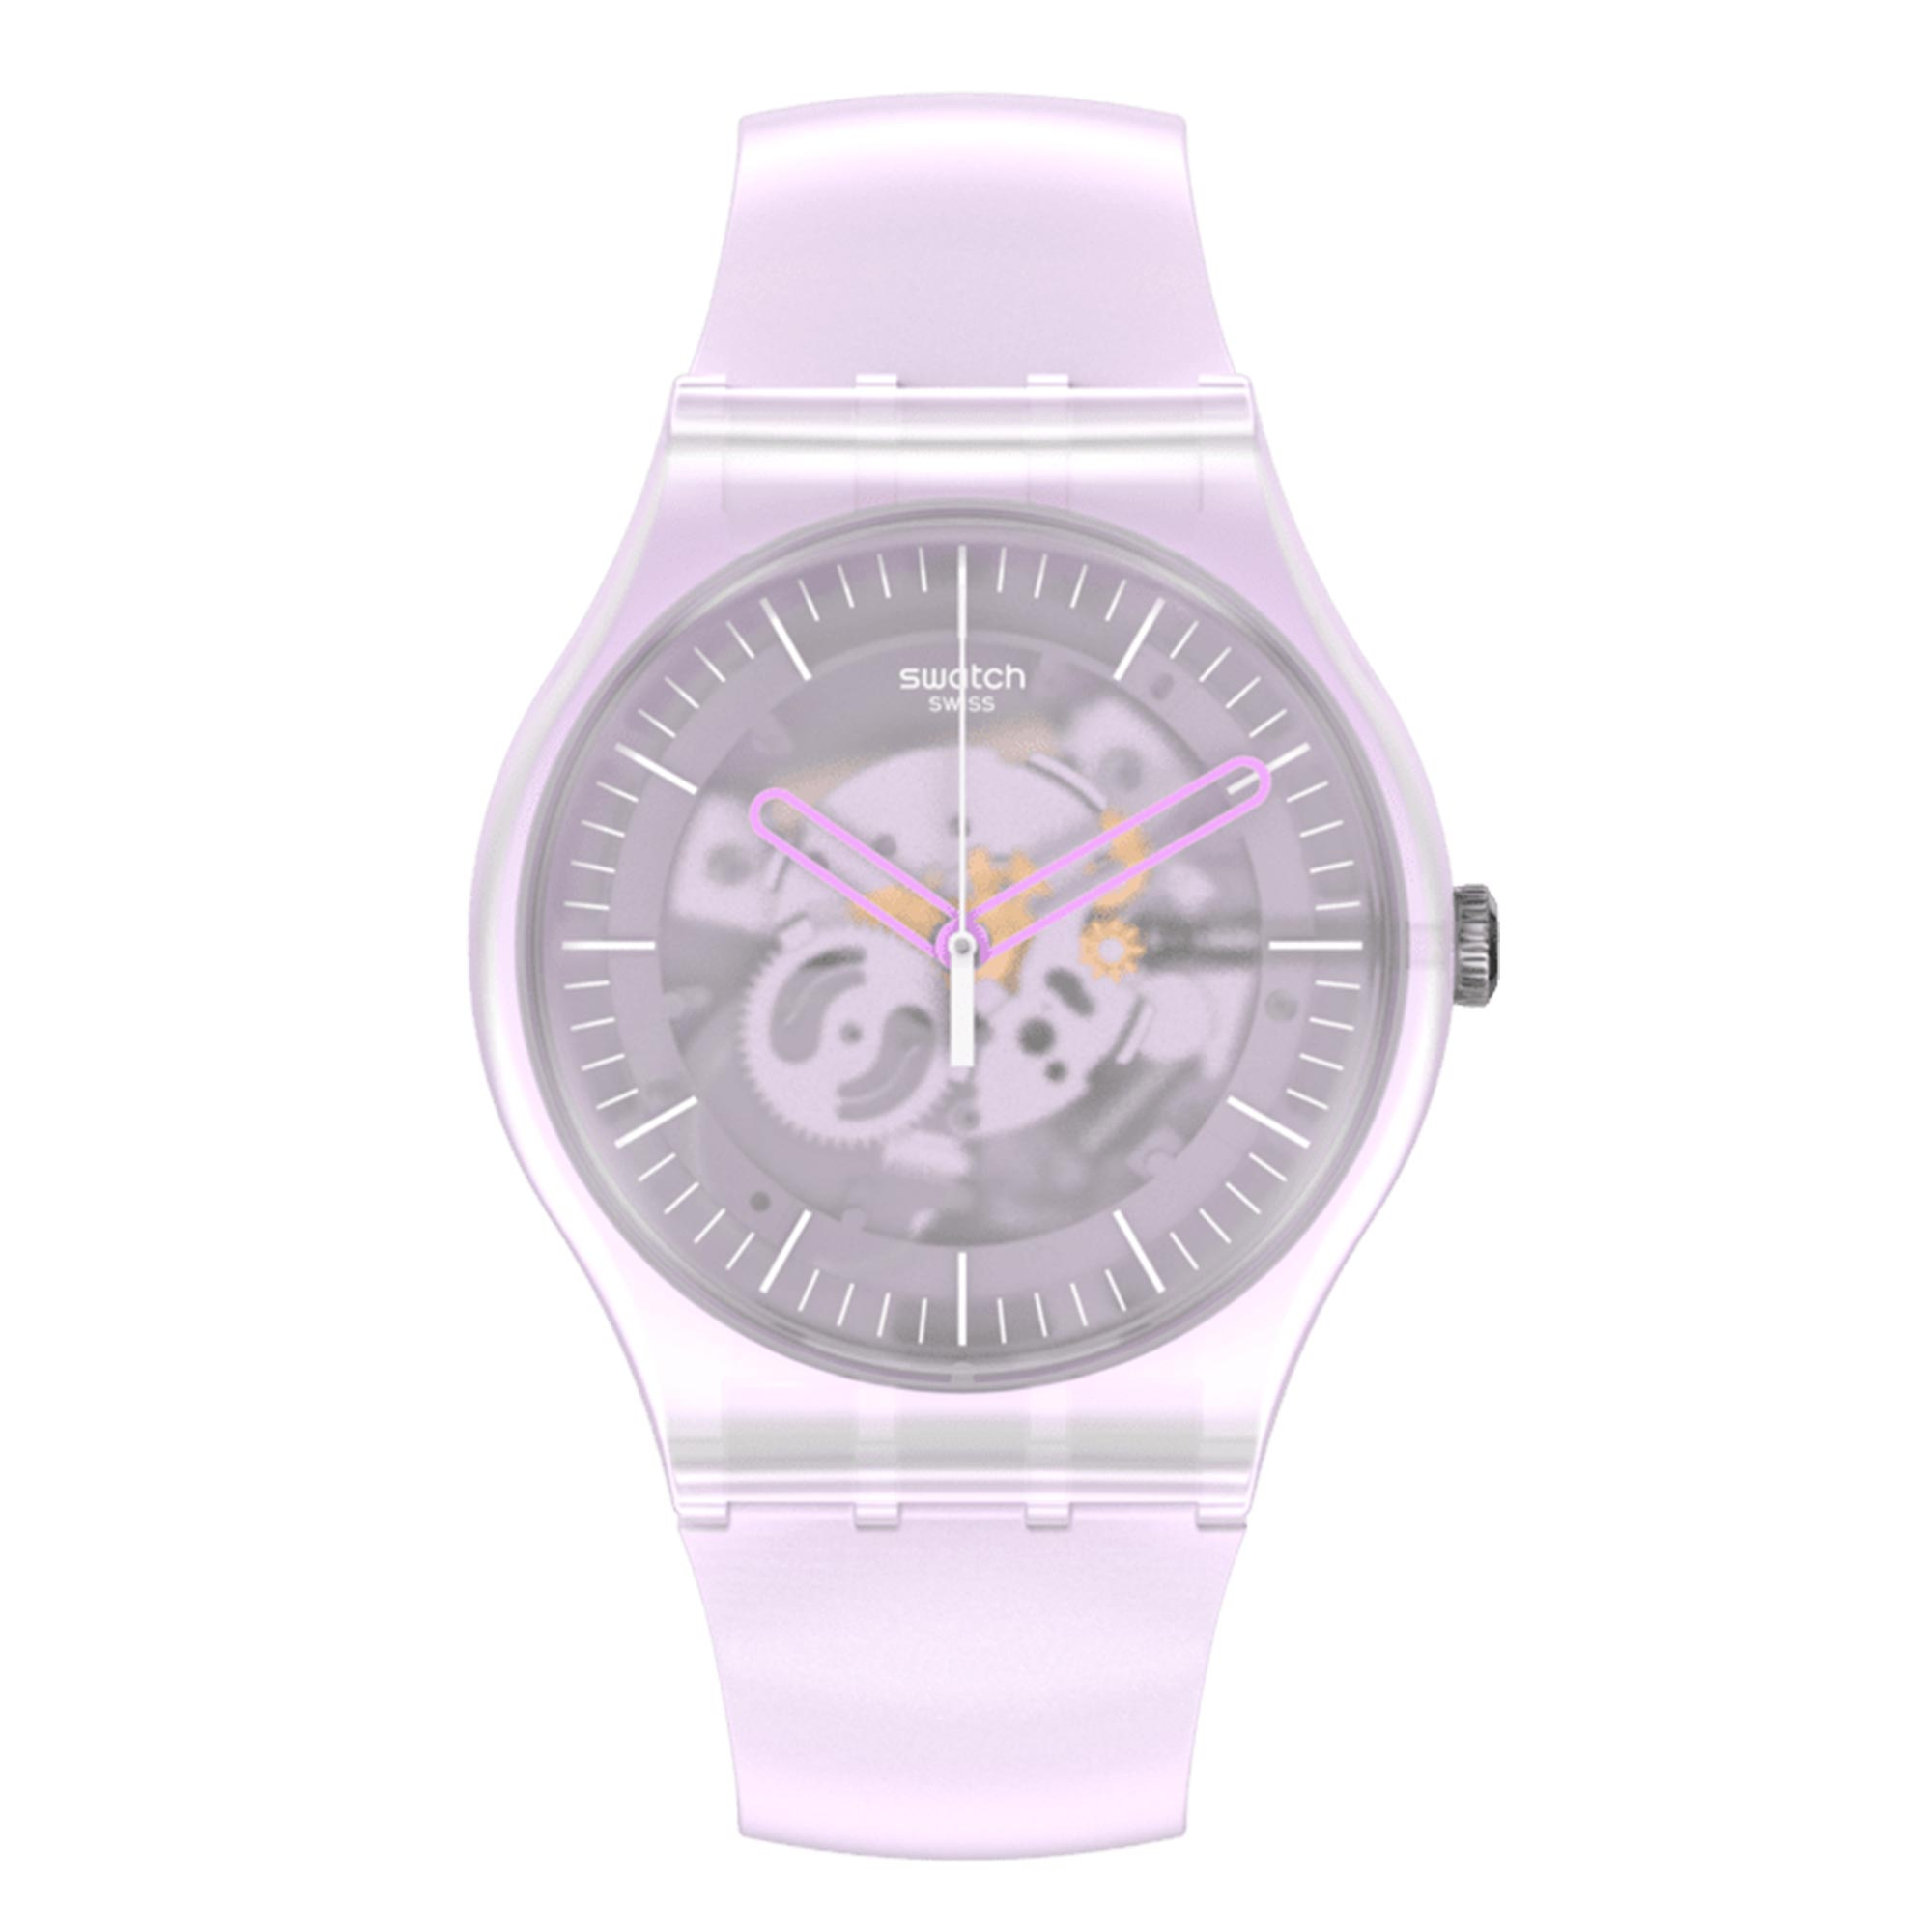 Swatch Pink Mist Quartz Movement Pink Dial Silicone Strap Watch SUOK155